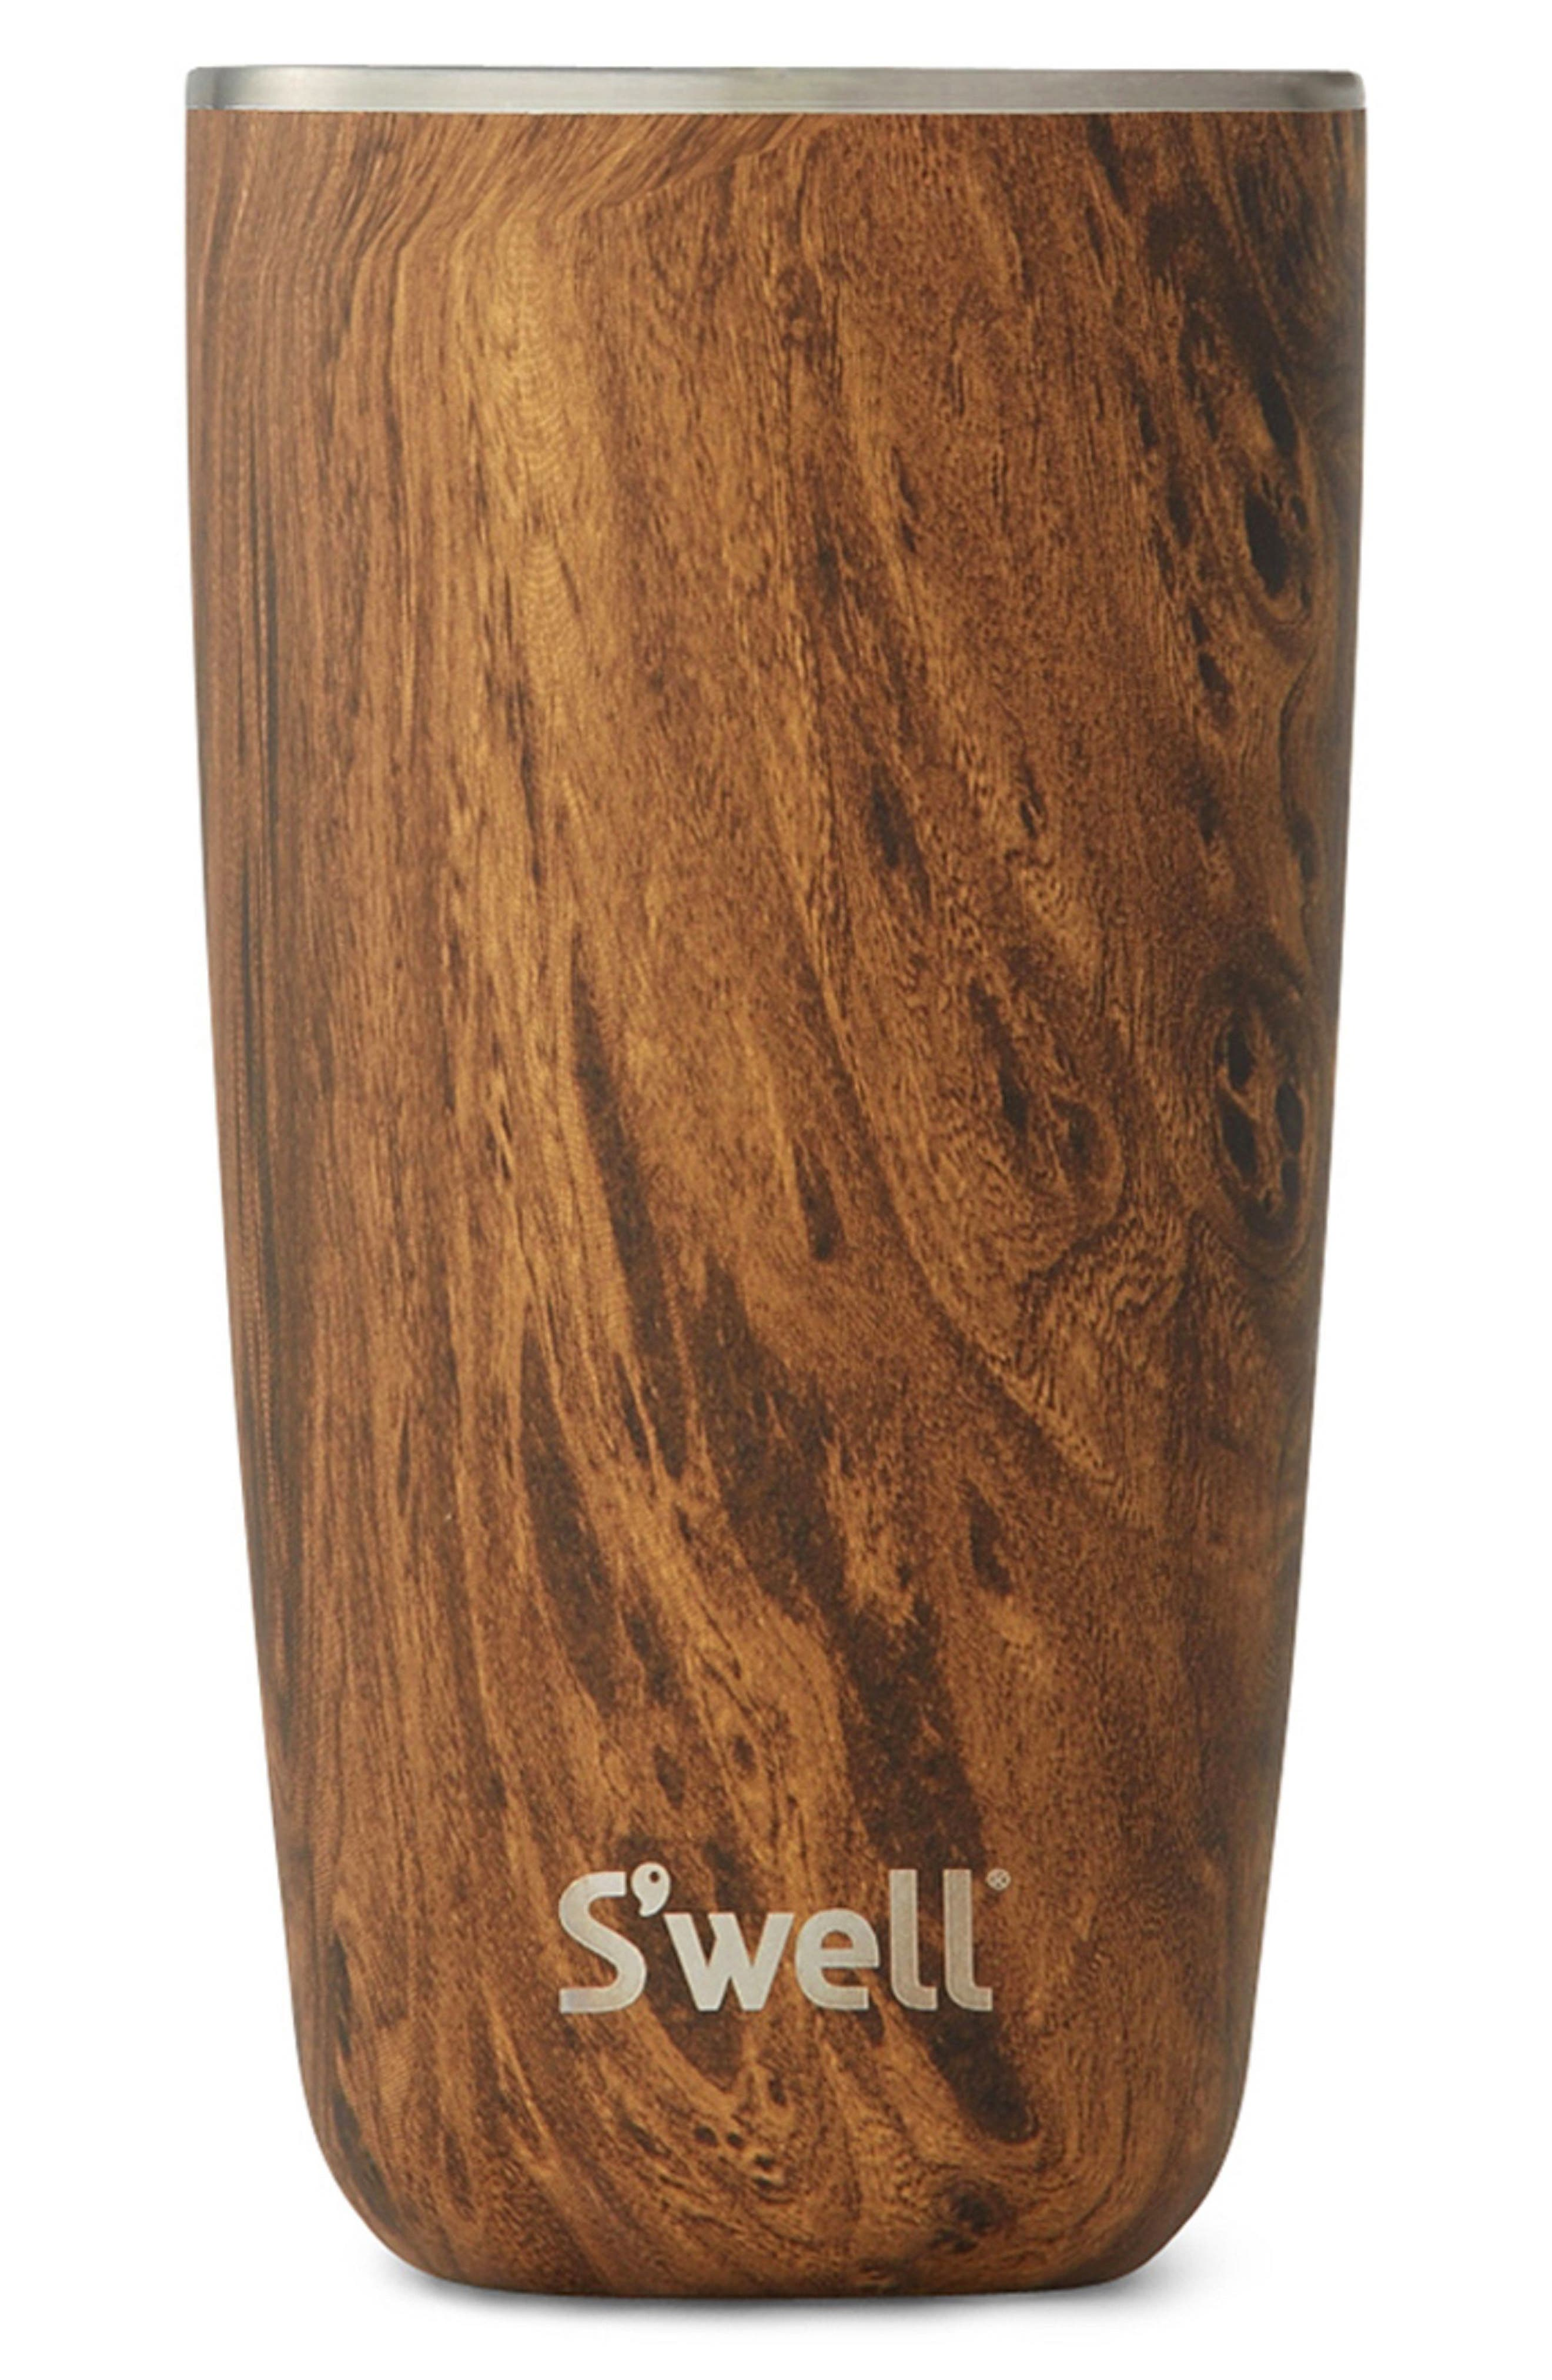 Teakwood 18-Ounce Stainless Steel Insulated Tumbler,                             Main thumbnail 1, color,                             Teakwood